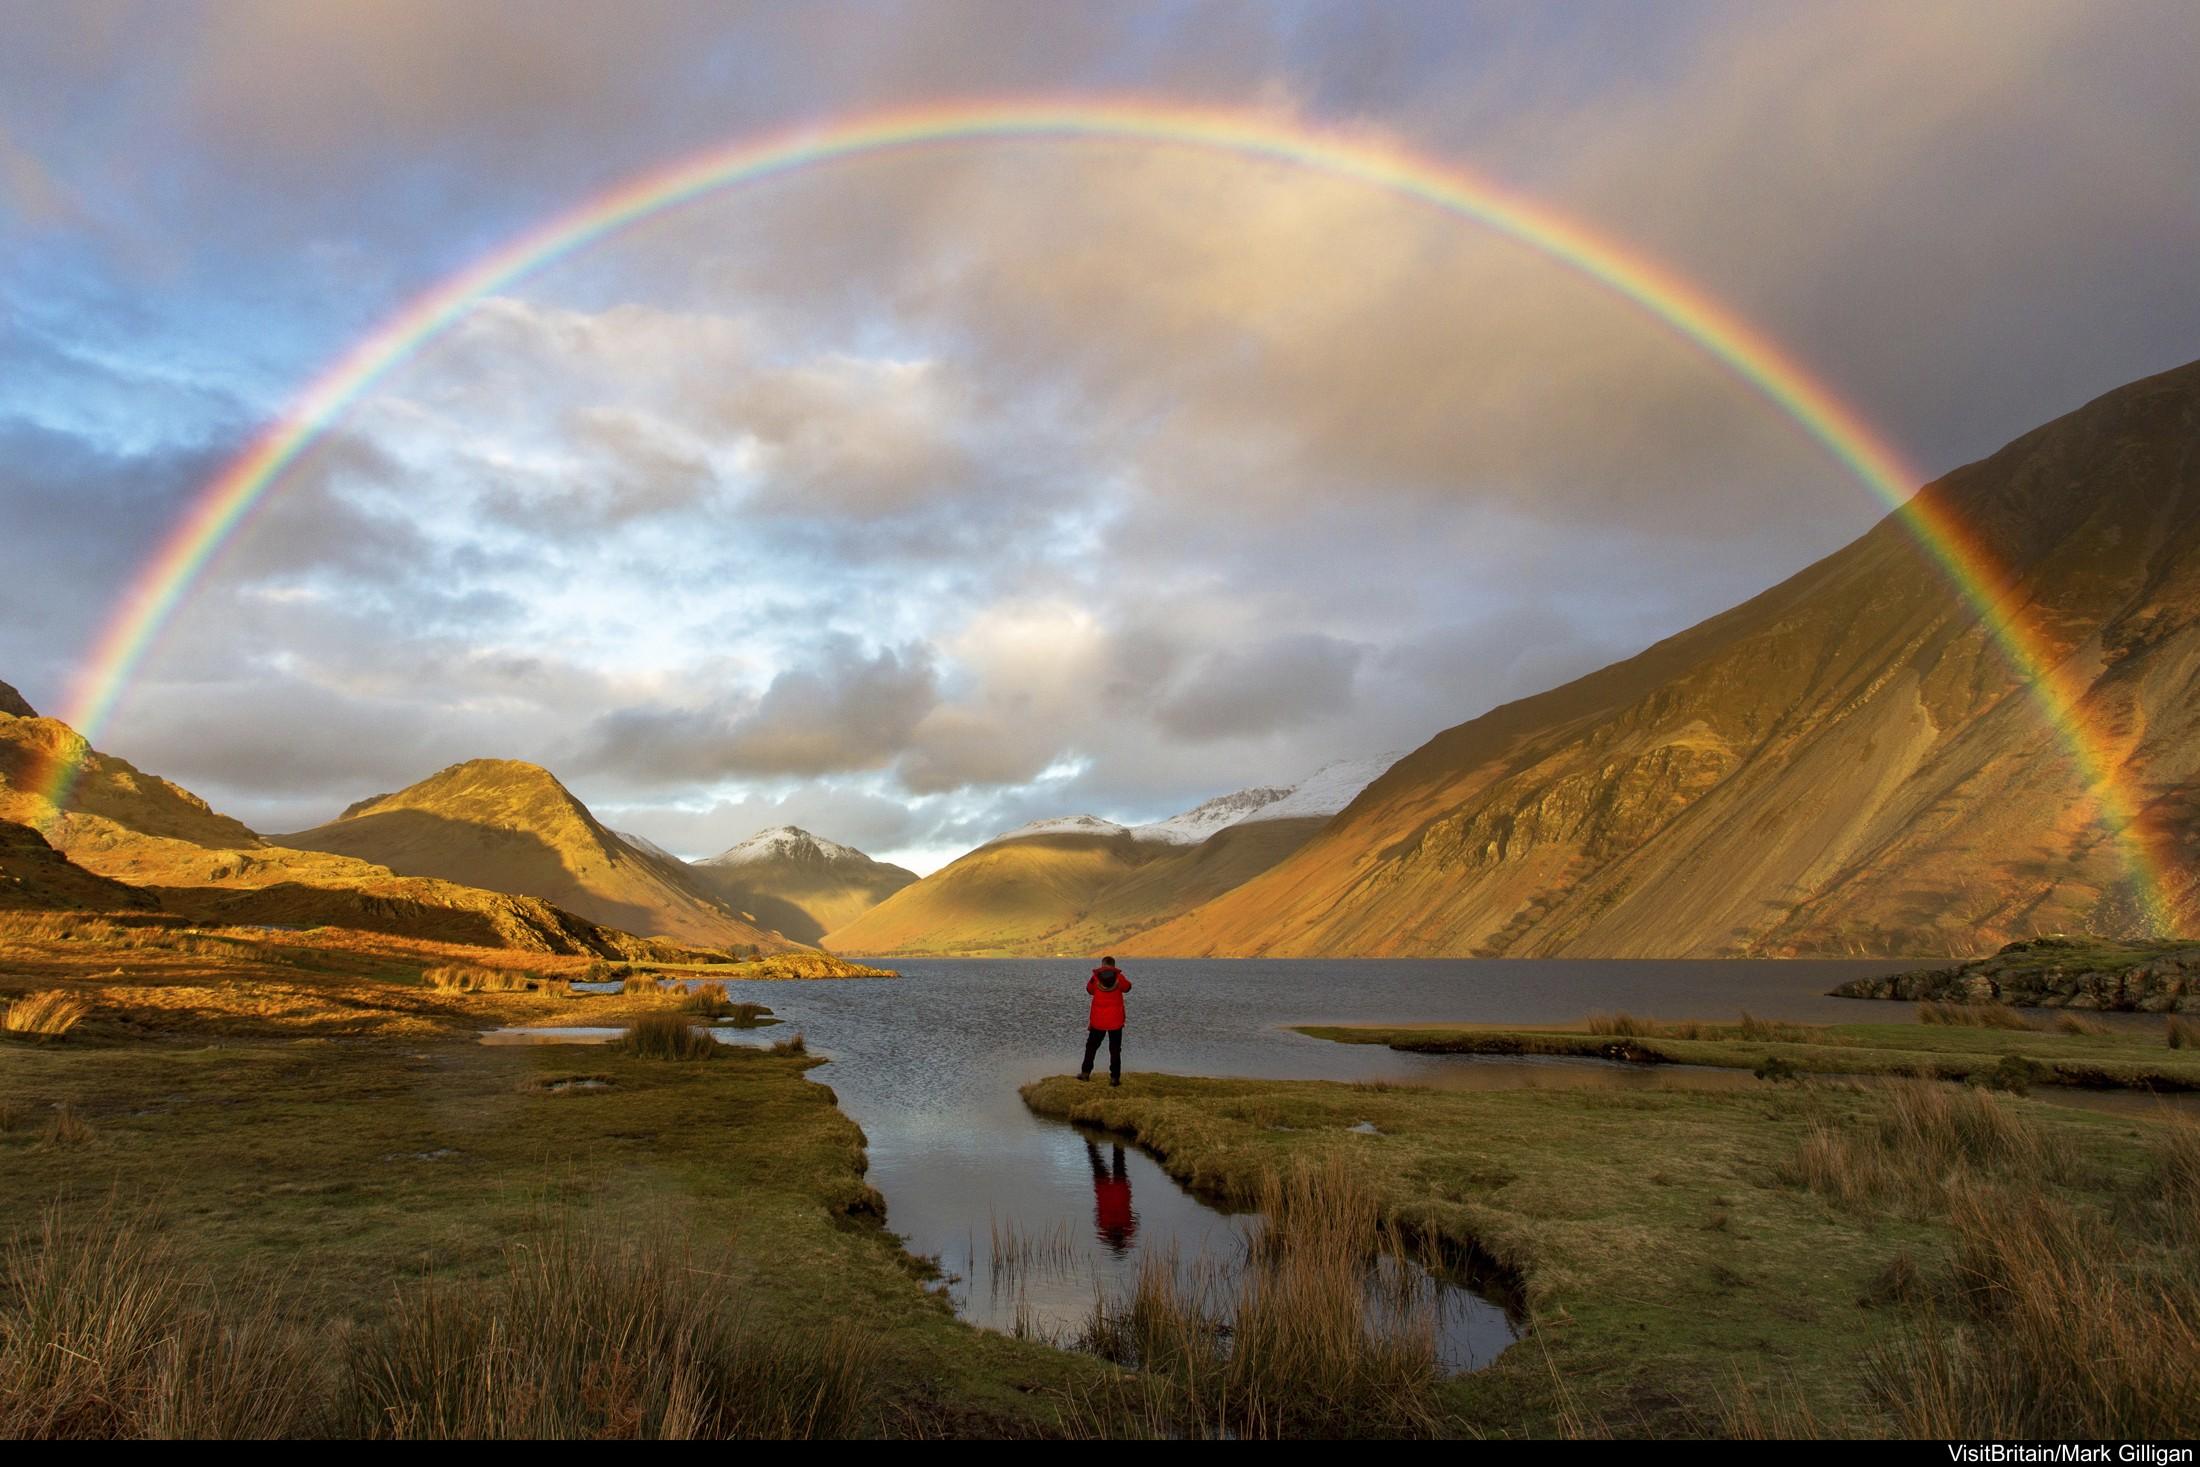 Lake District. Image courtesy of Visit Britain